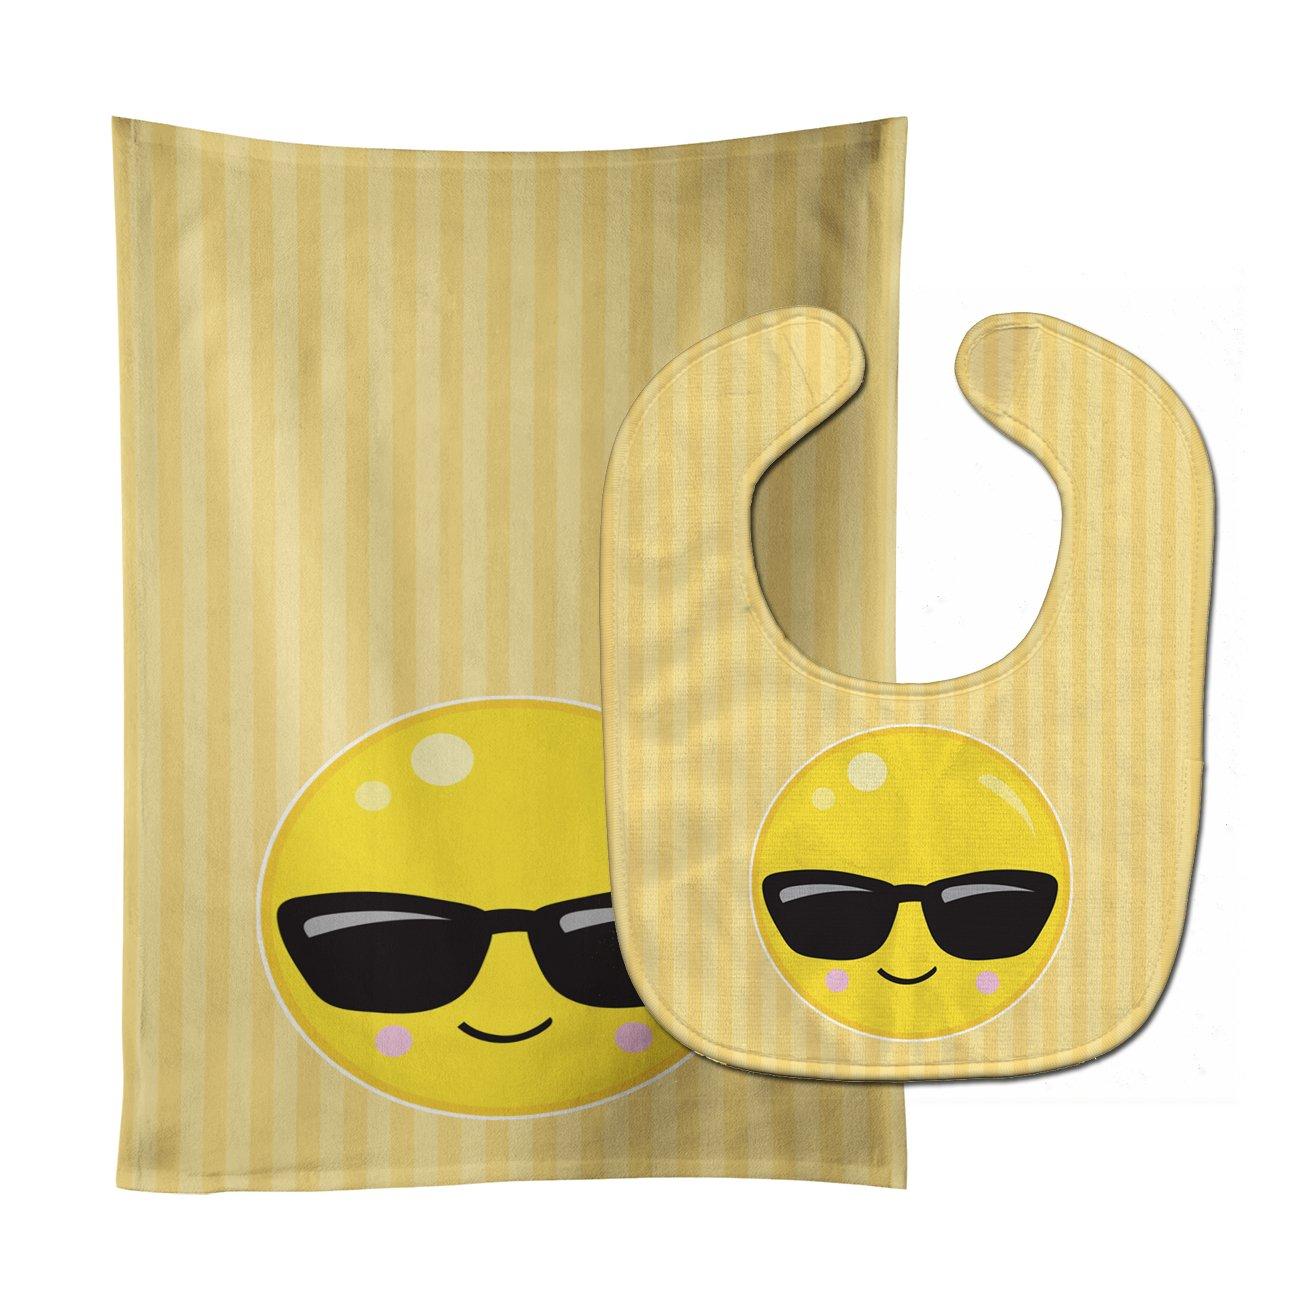 Carolines Treasures BB8740STBU Cool Sunglass Face Baby Bib & Burp Cloth, 11 x 18, multicolor